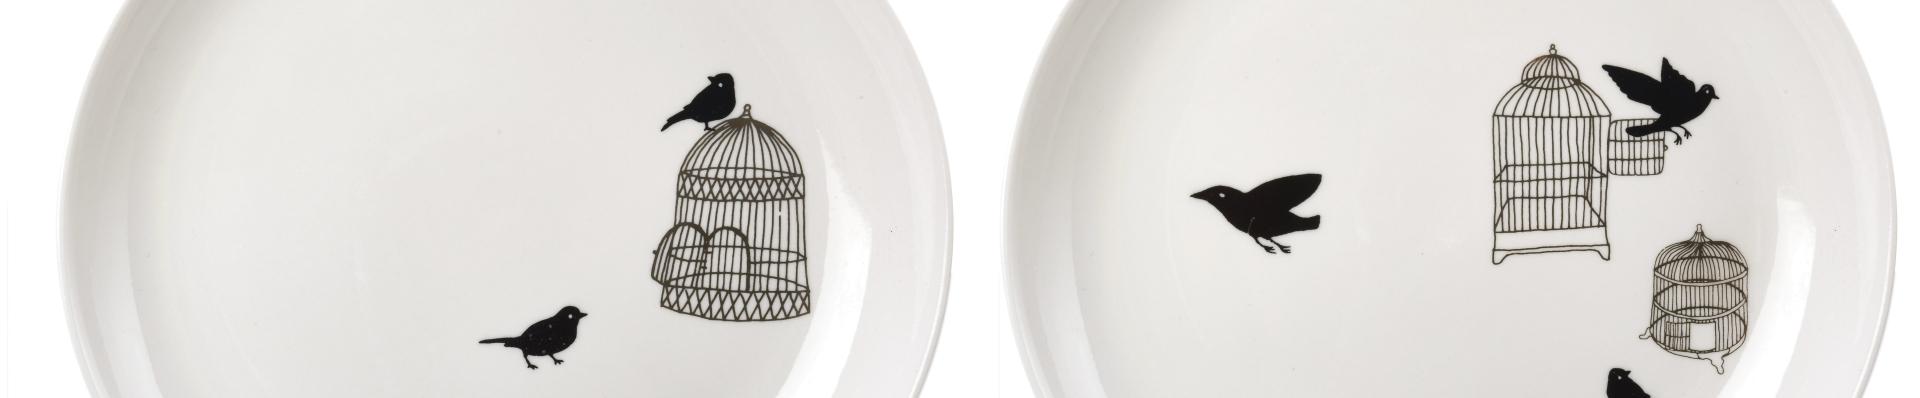 Pols Potten Freedom Birds